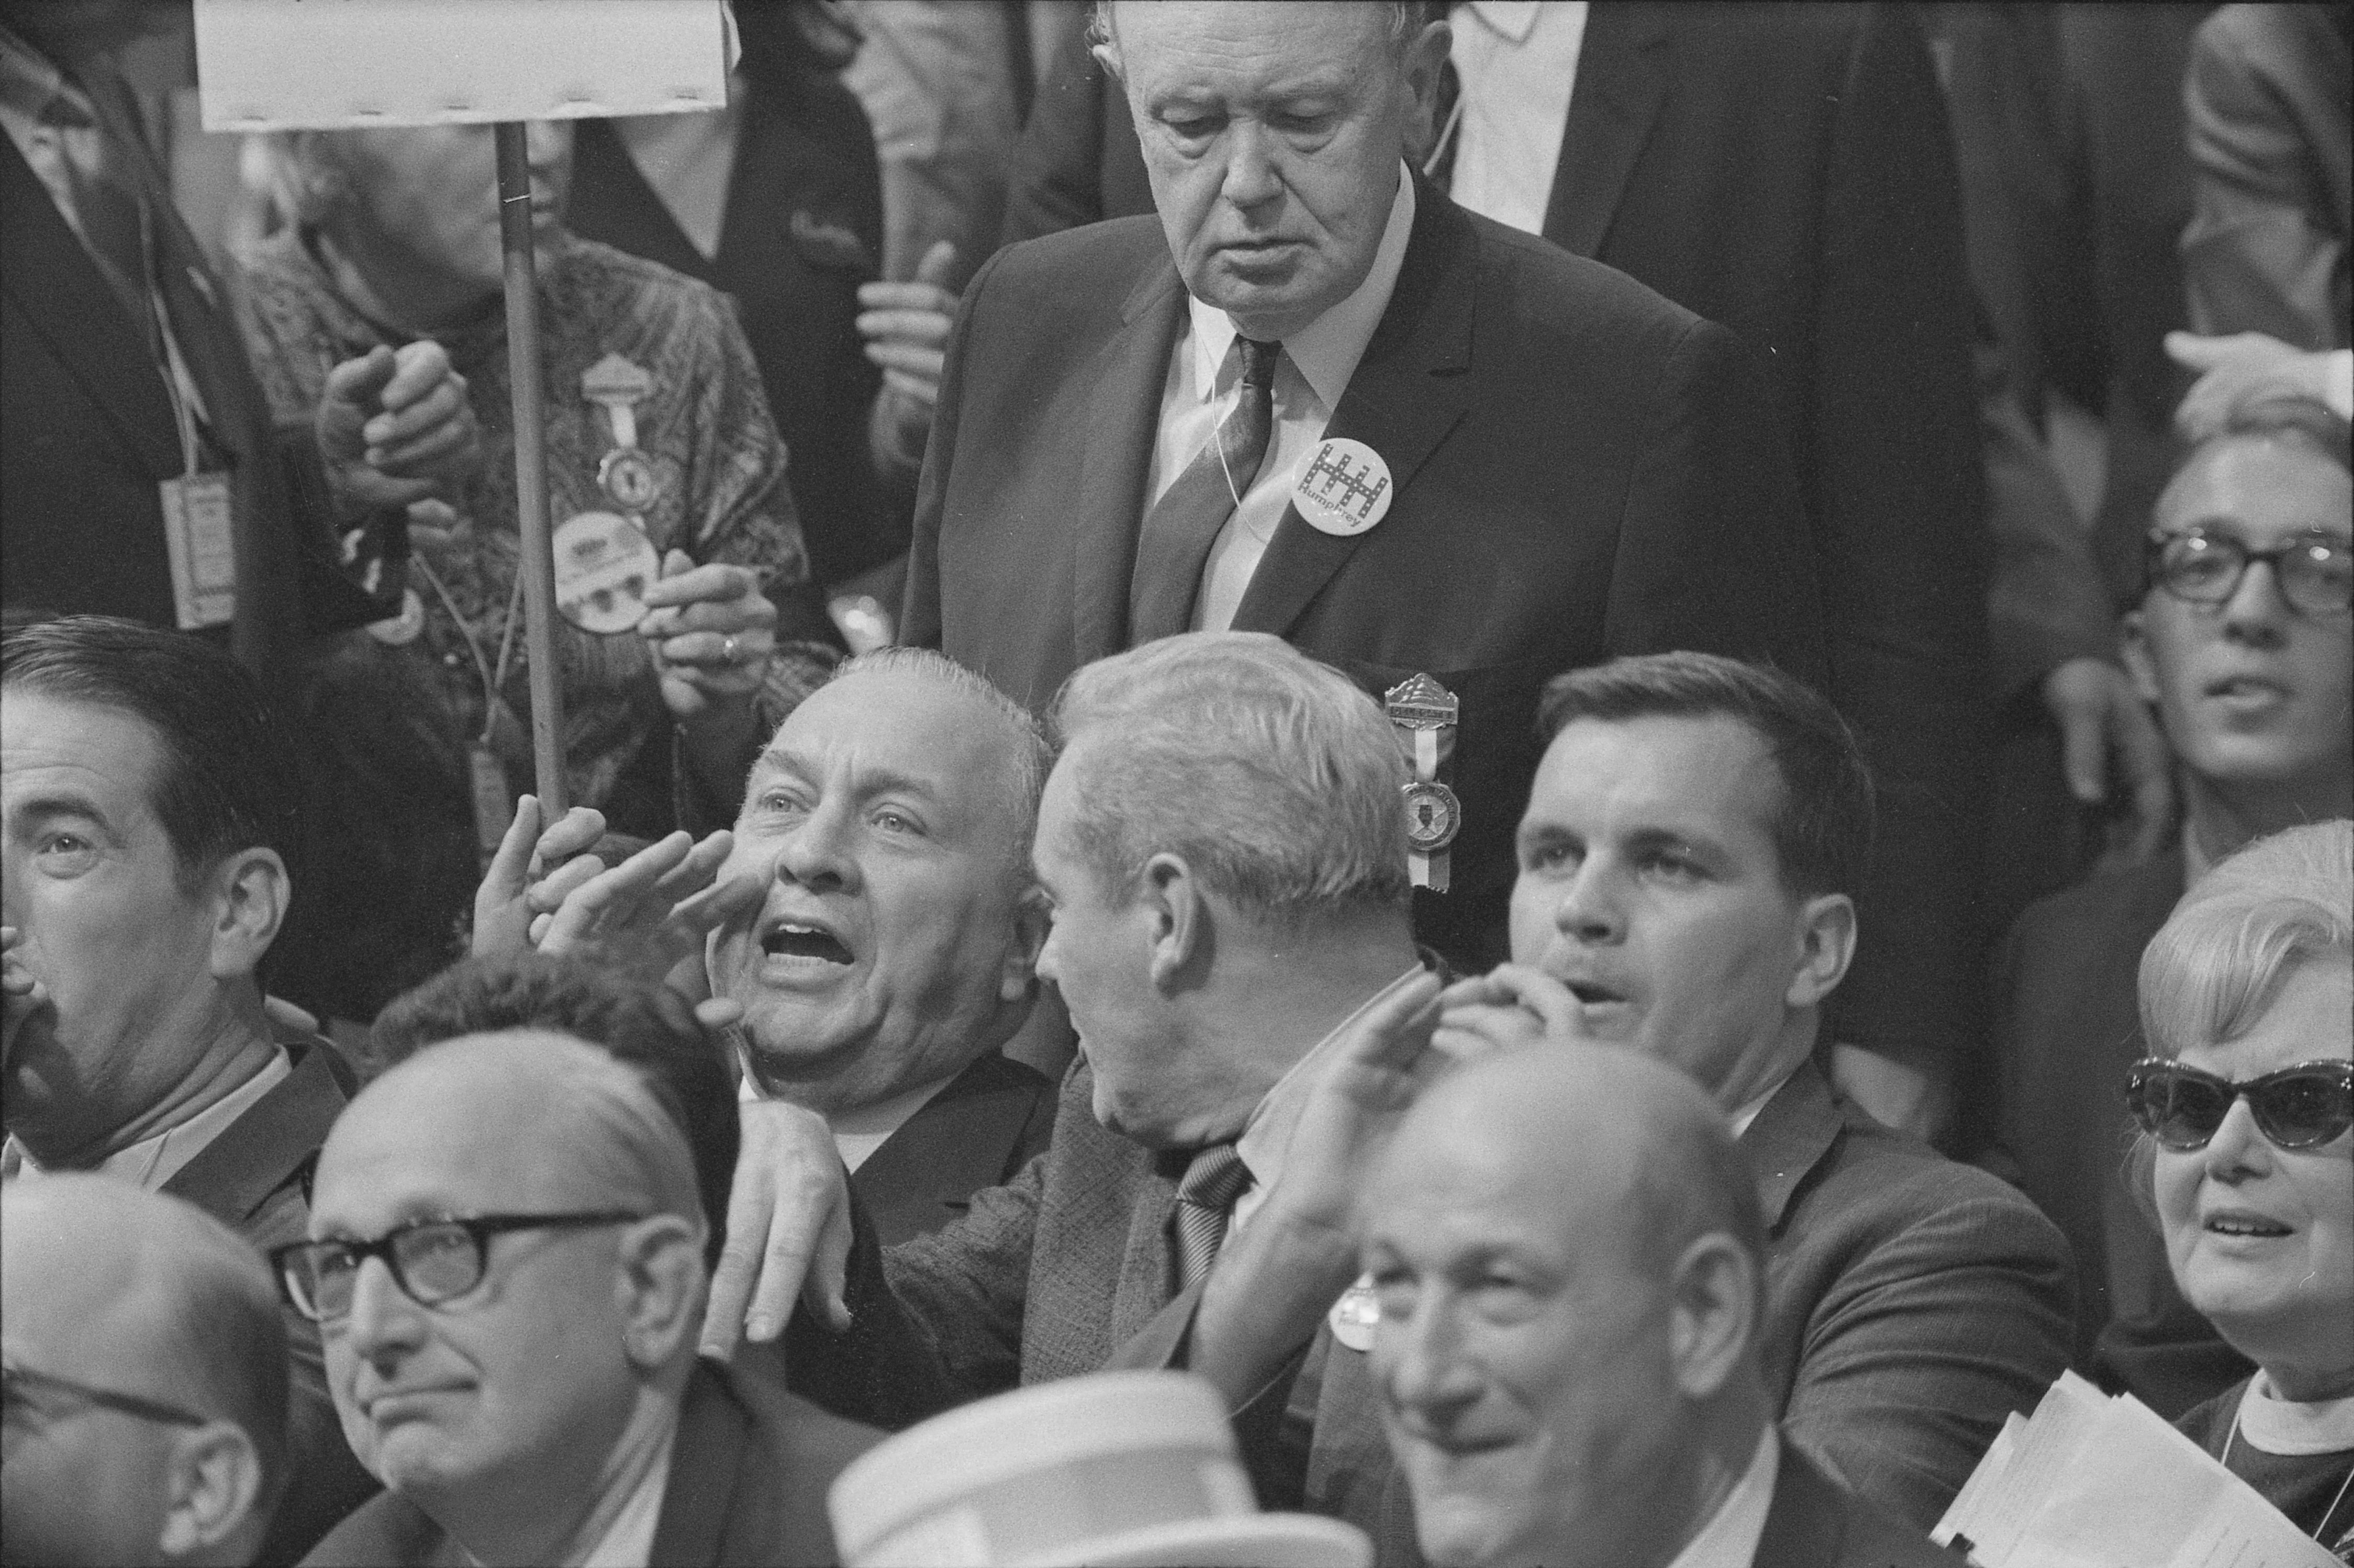 FileIllinois Delegates At The Democratic National Convention Of 1968 React To Senator Ribicoffs